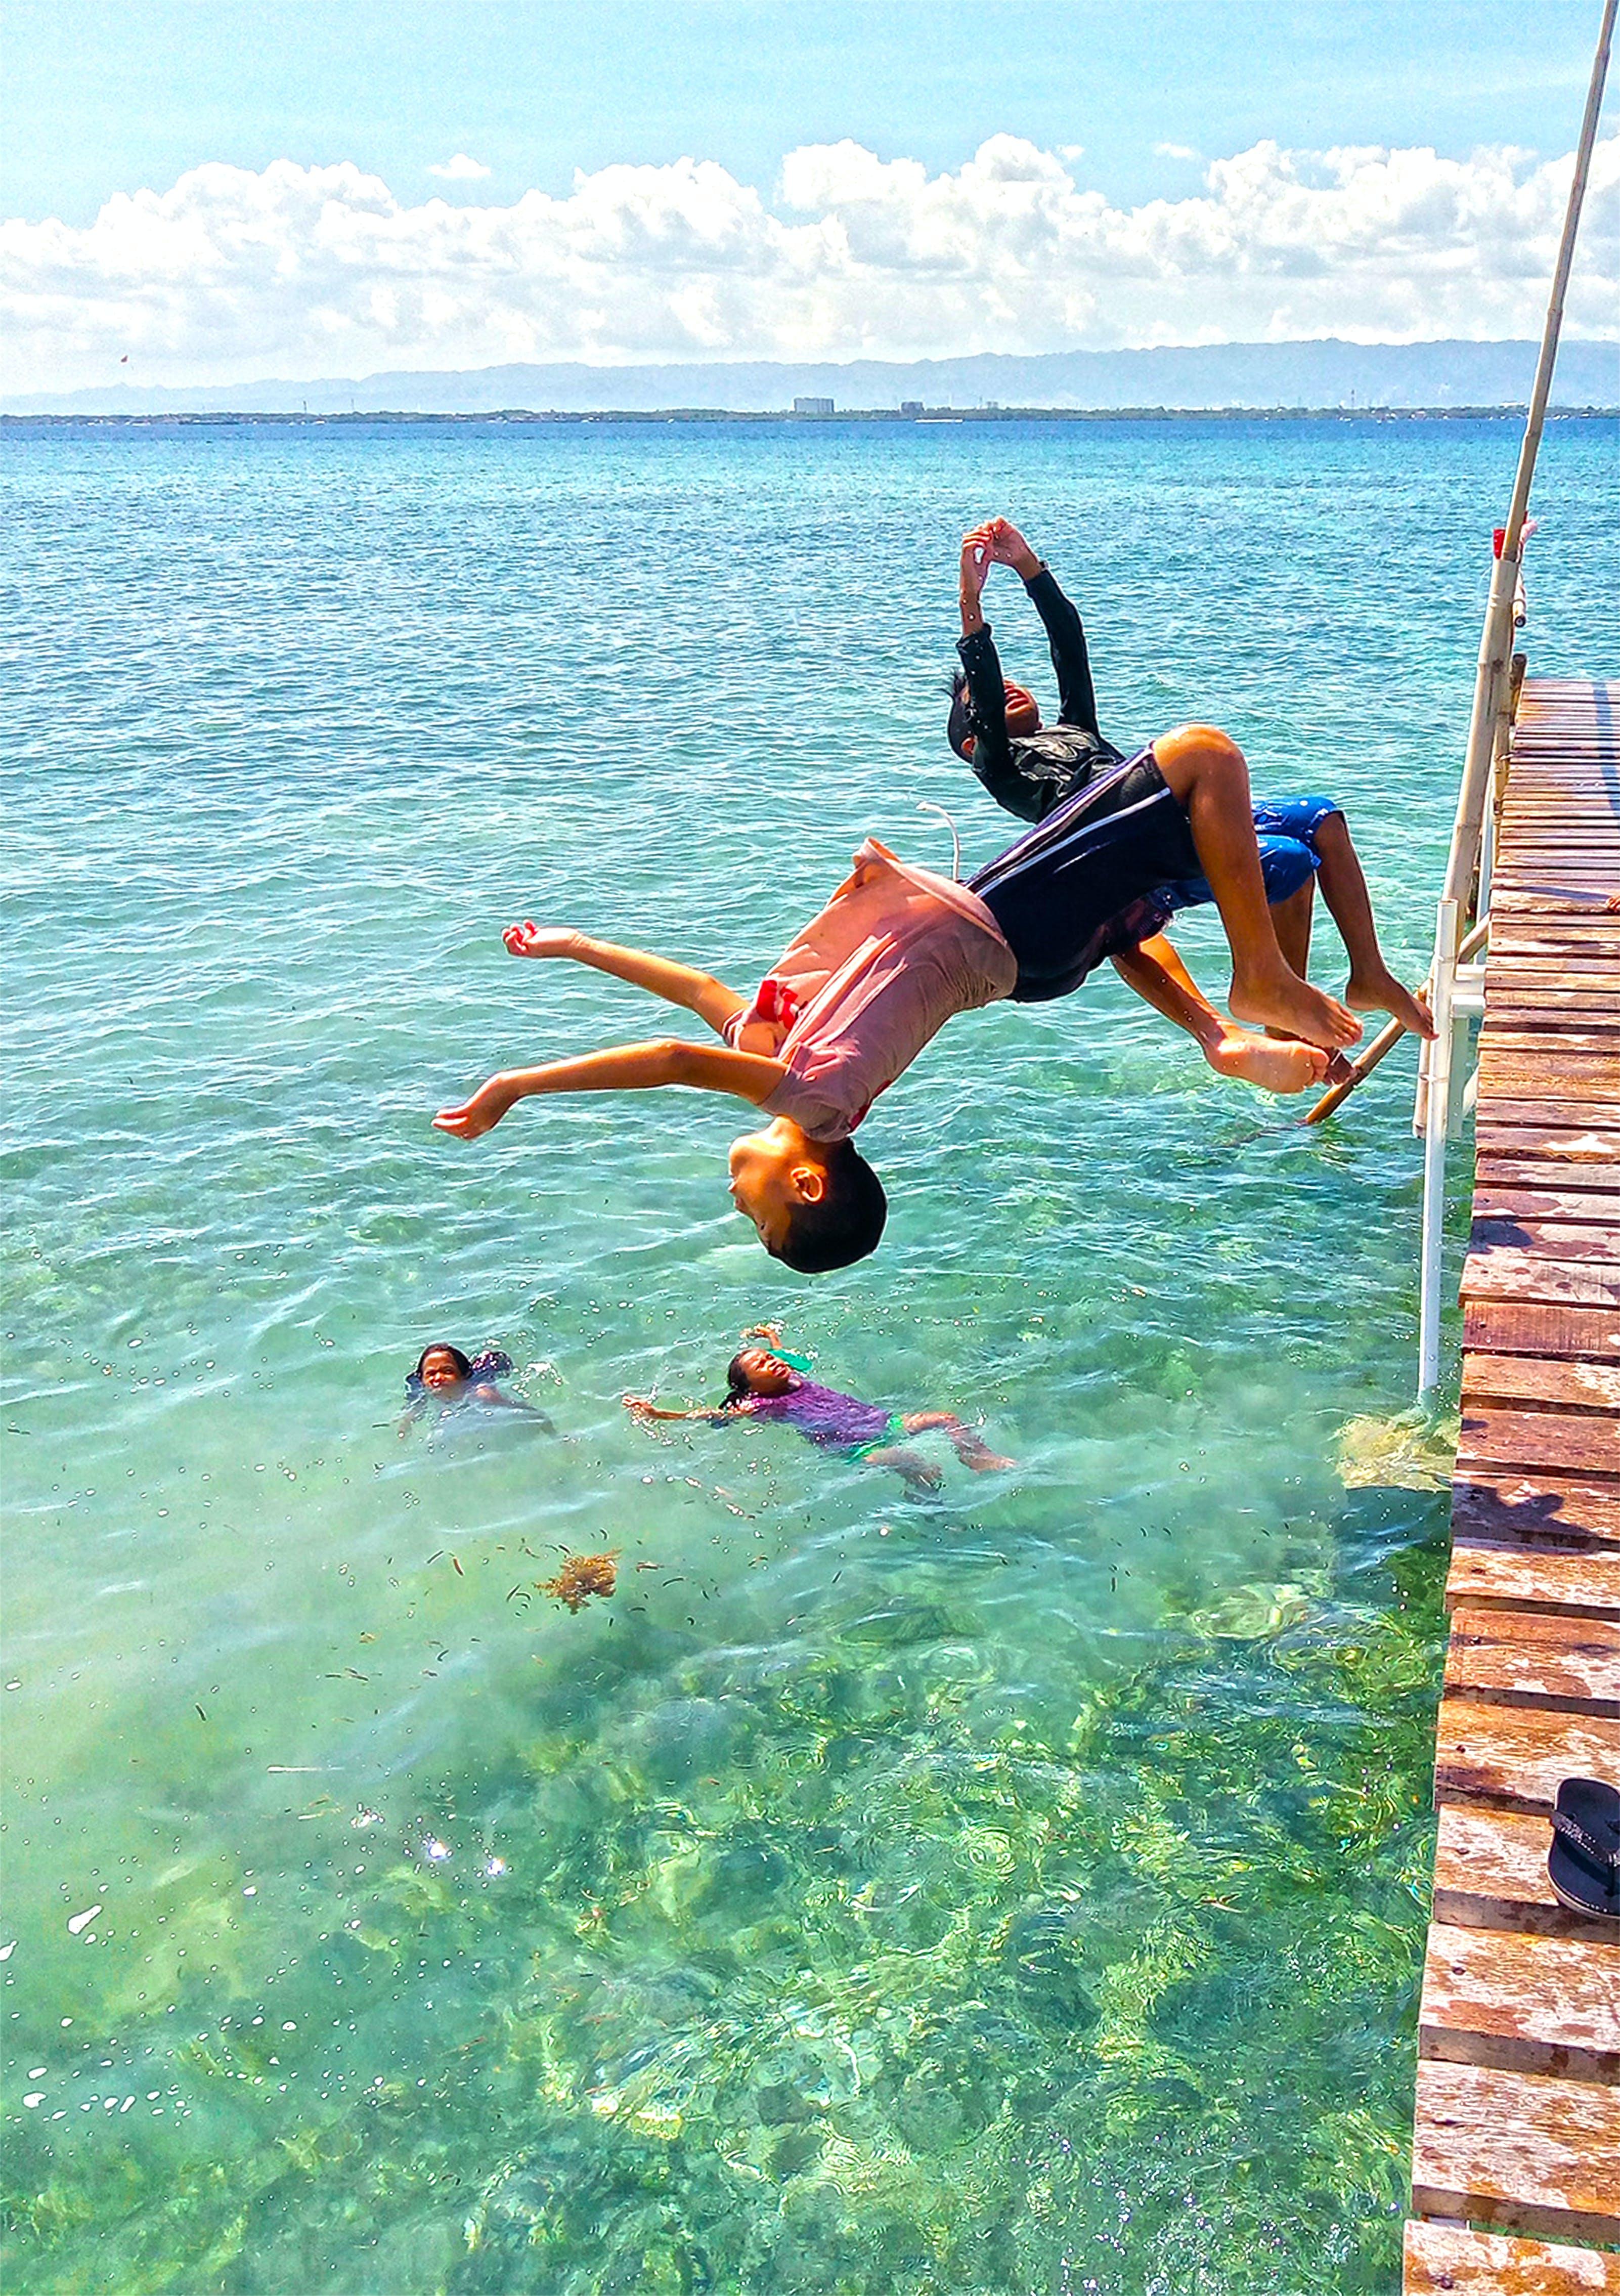 Free stock photo of #outdoorchallenge, adventures, beachlife, challenges